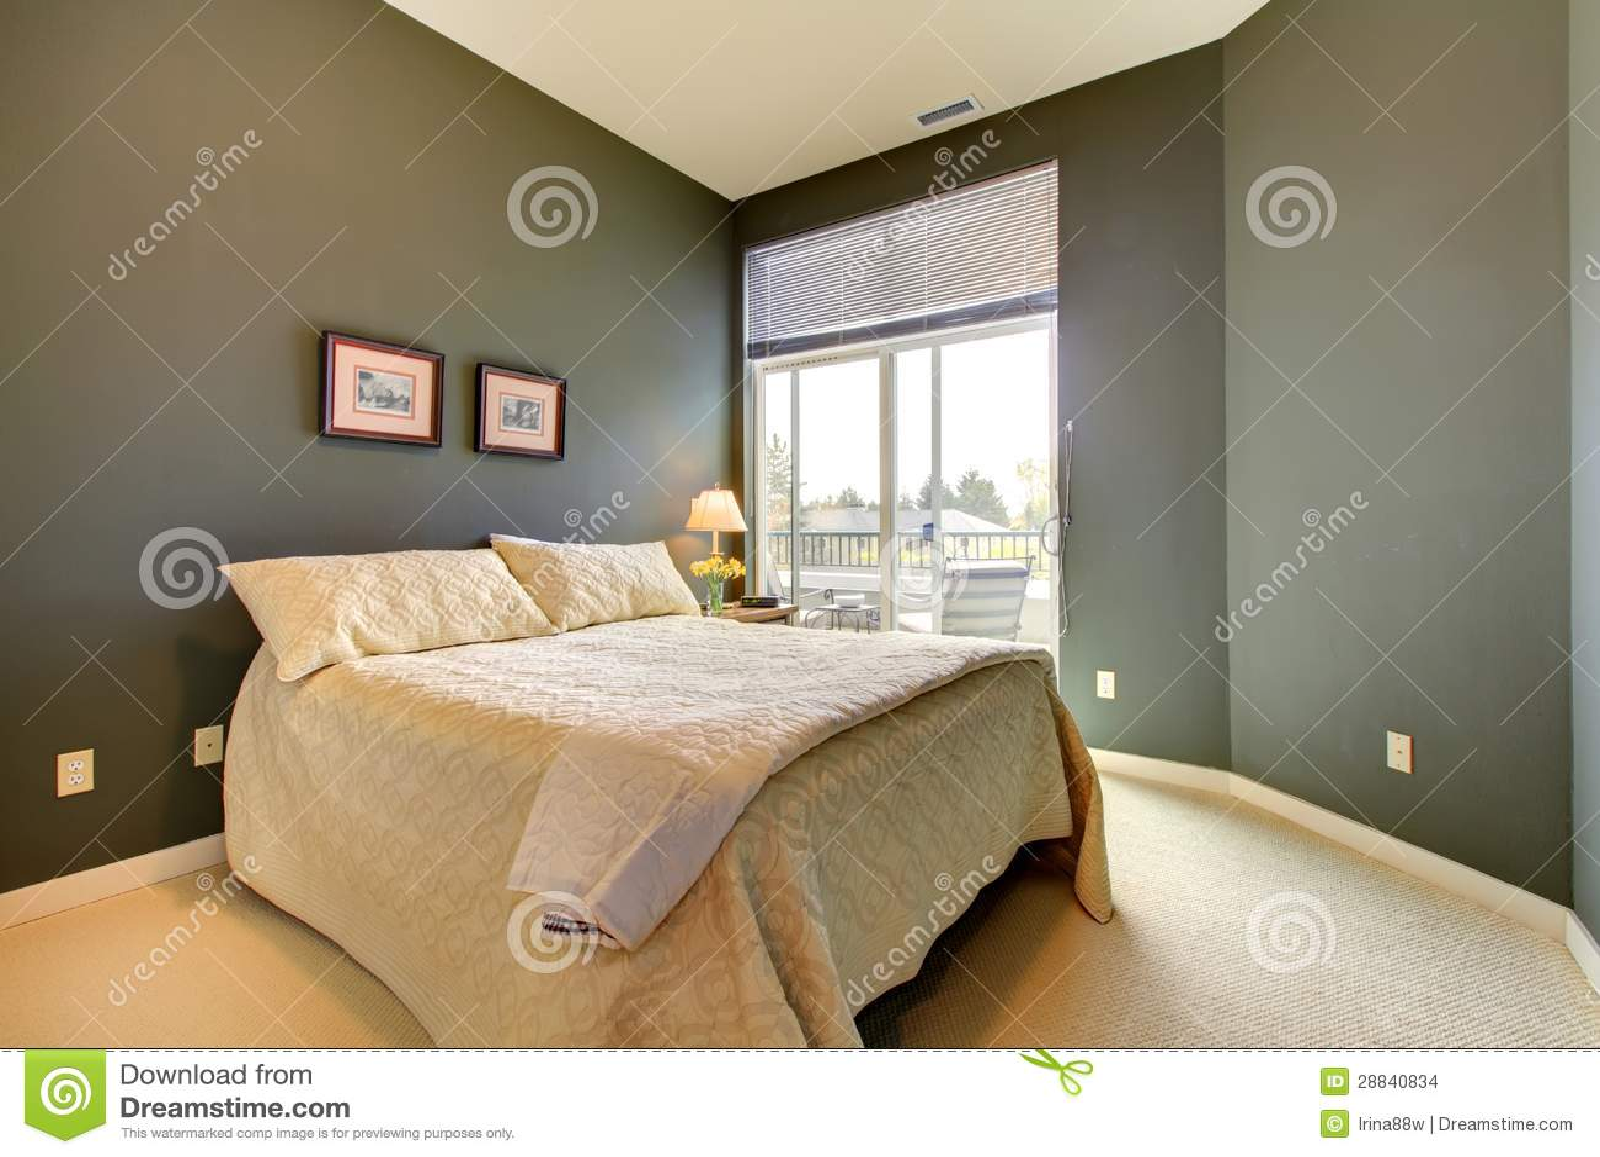 Bedroom Wiht Grey Green Walls And White Bedding Stock Images  Image: 28840834 - 8 Bedroom Floor Plans